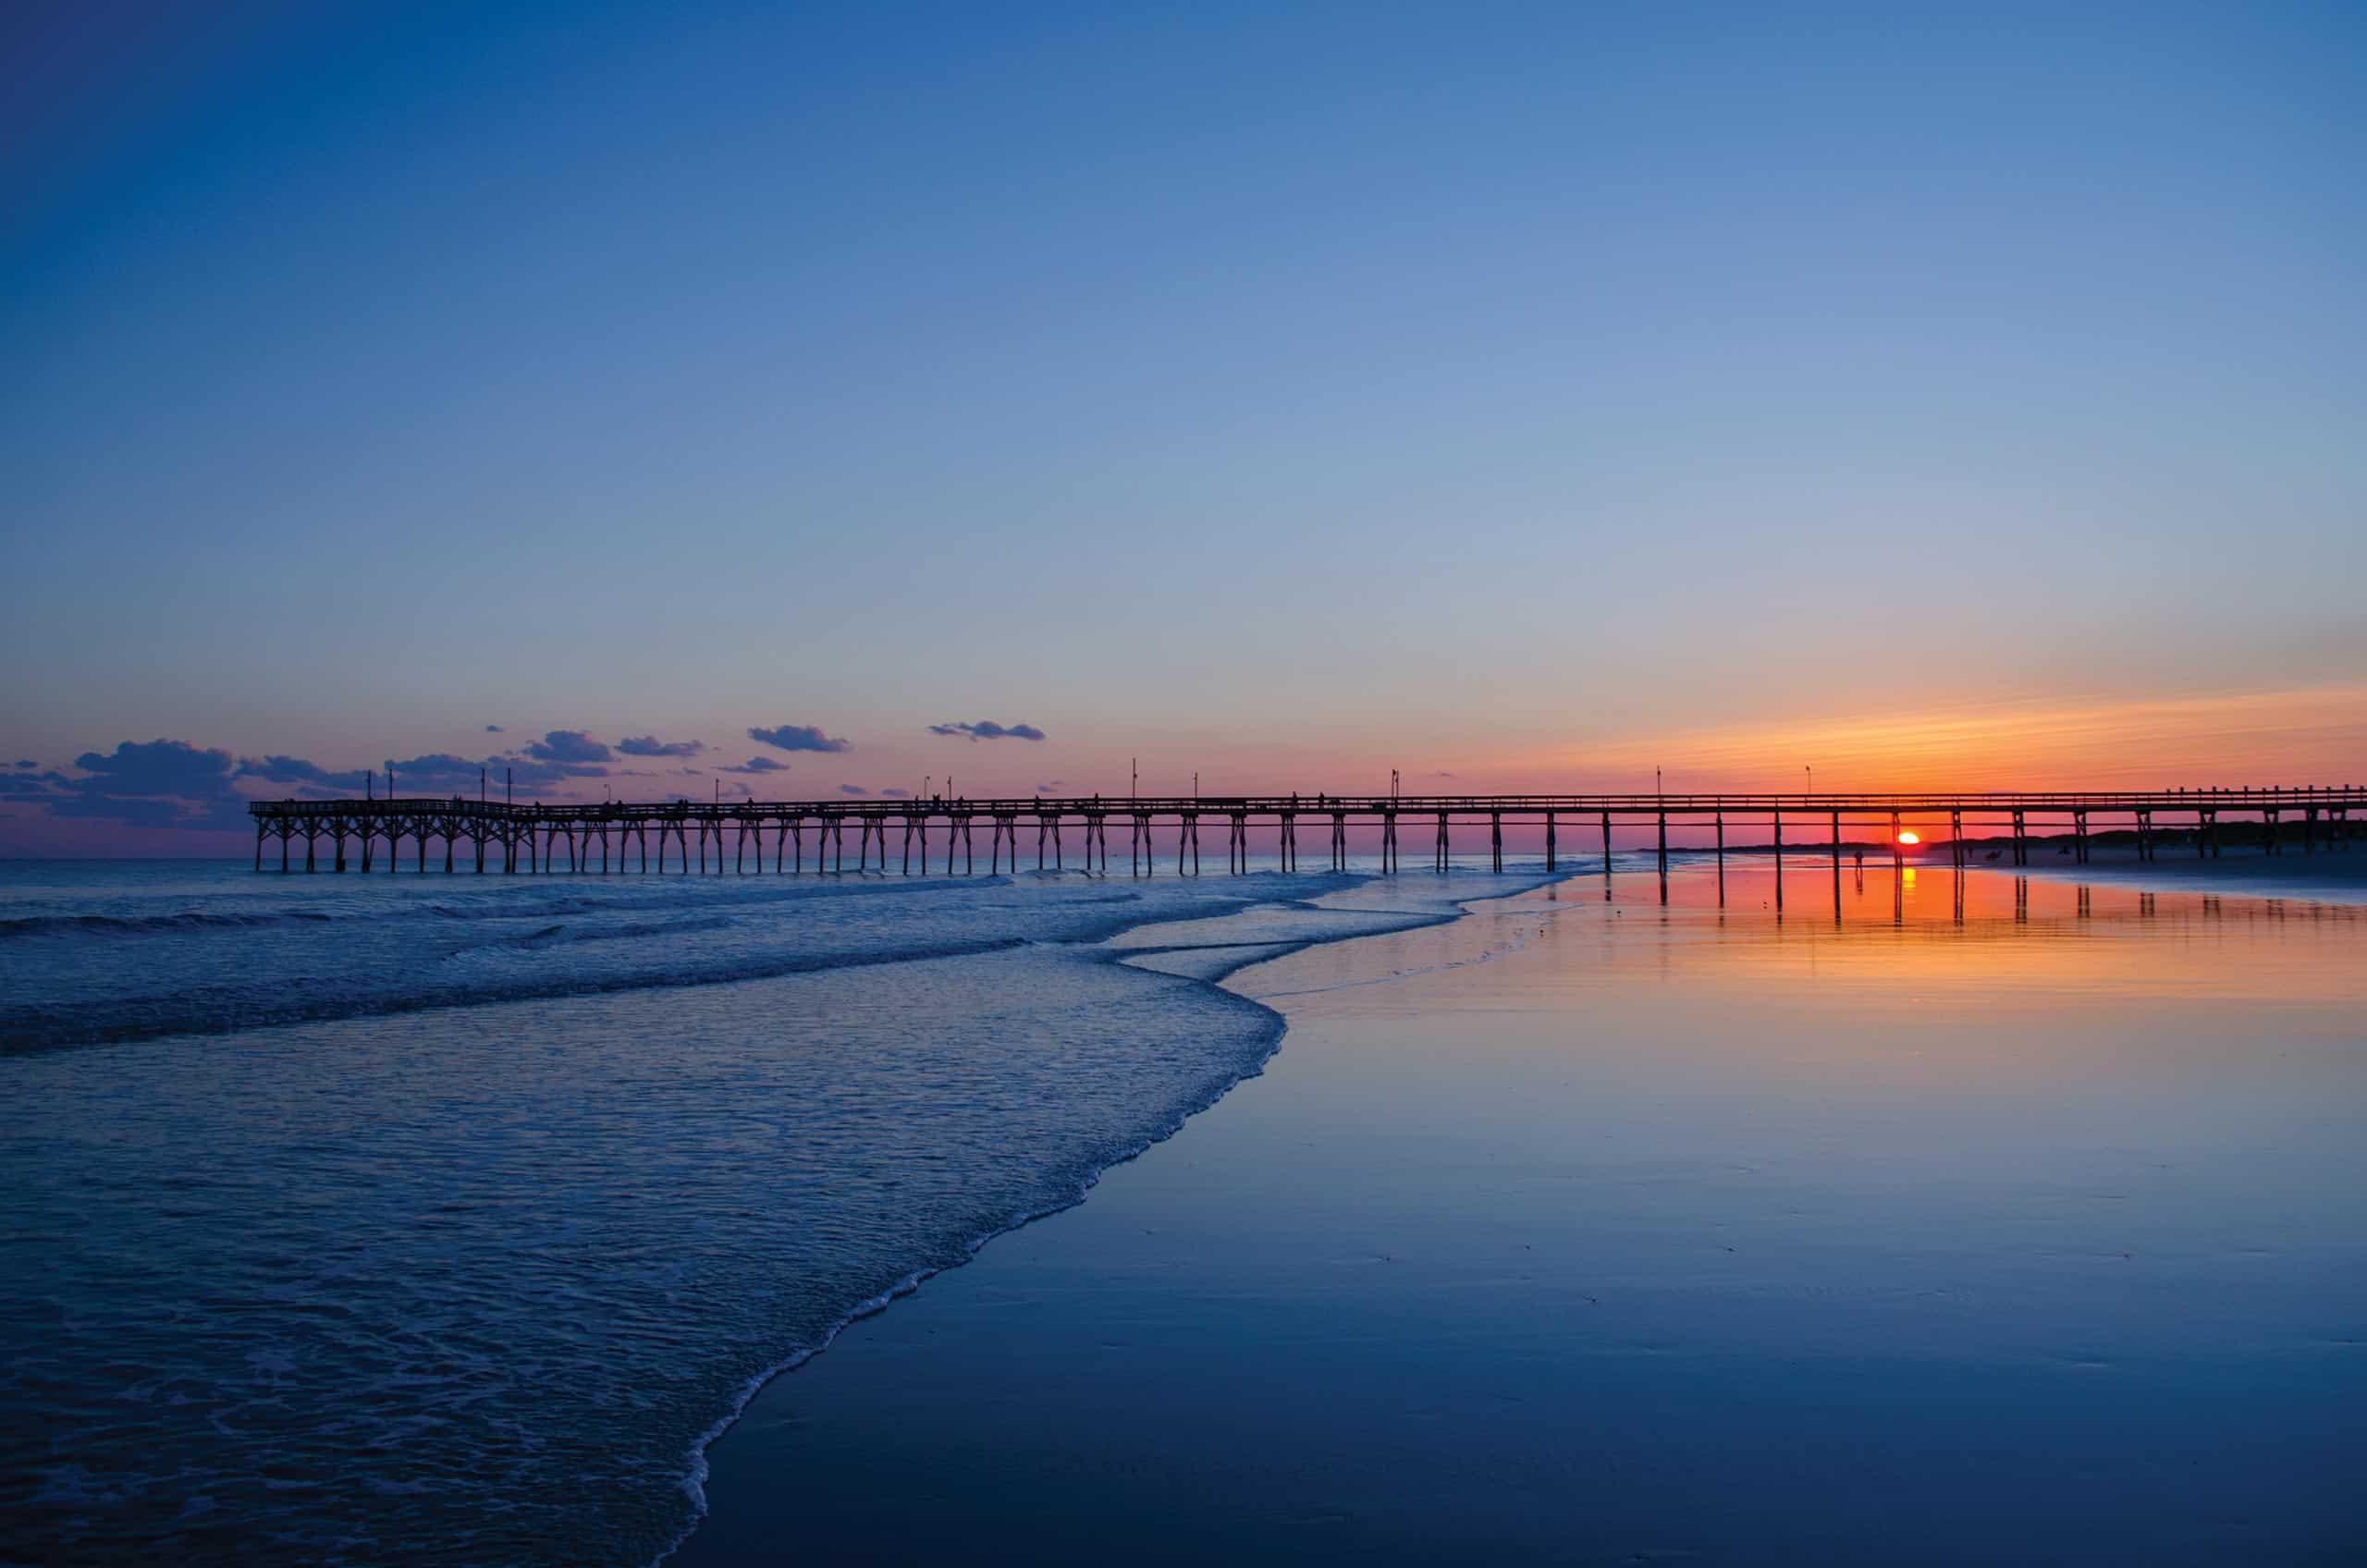 Sunset Beach North Carolina Beach and Coast